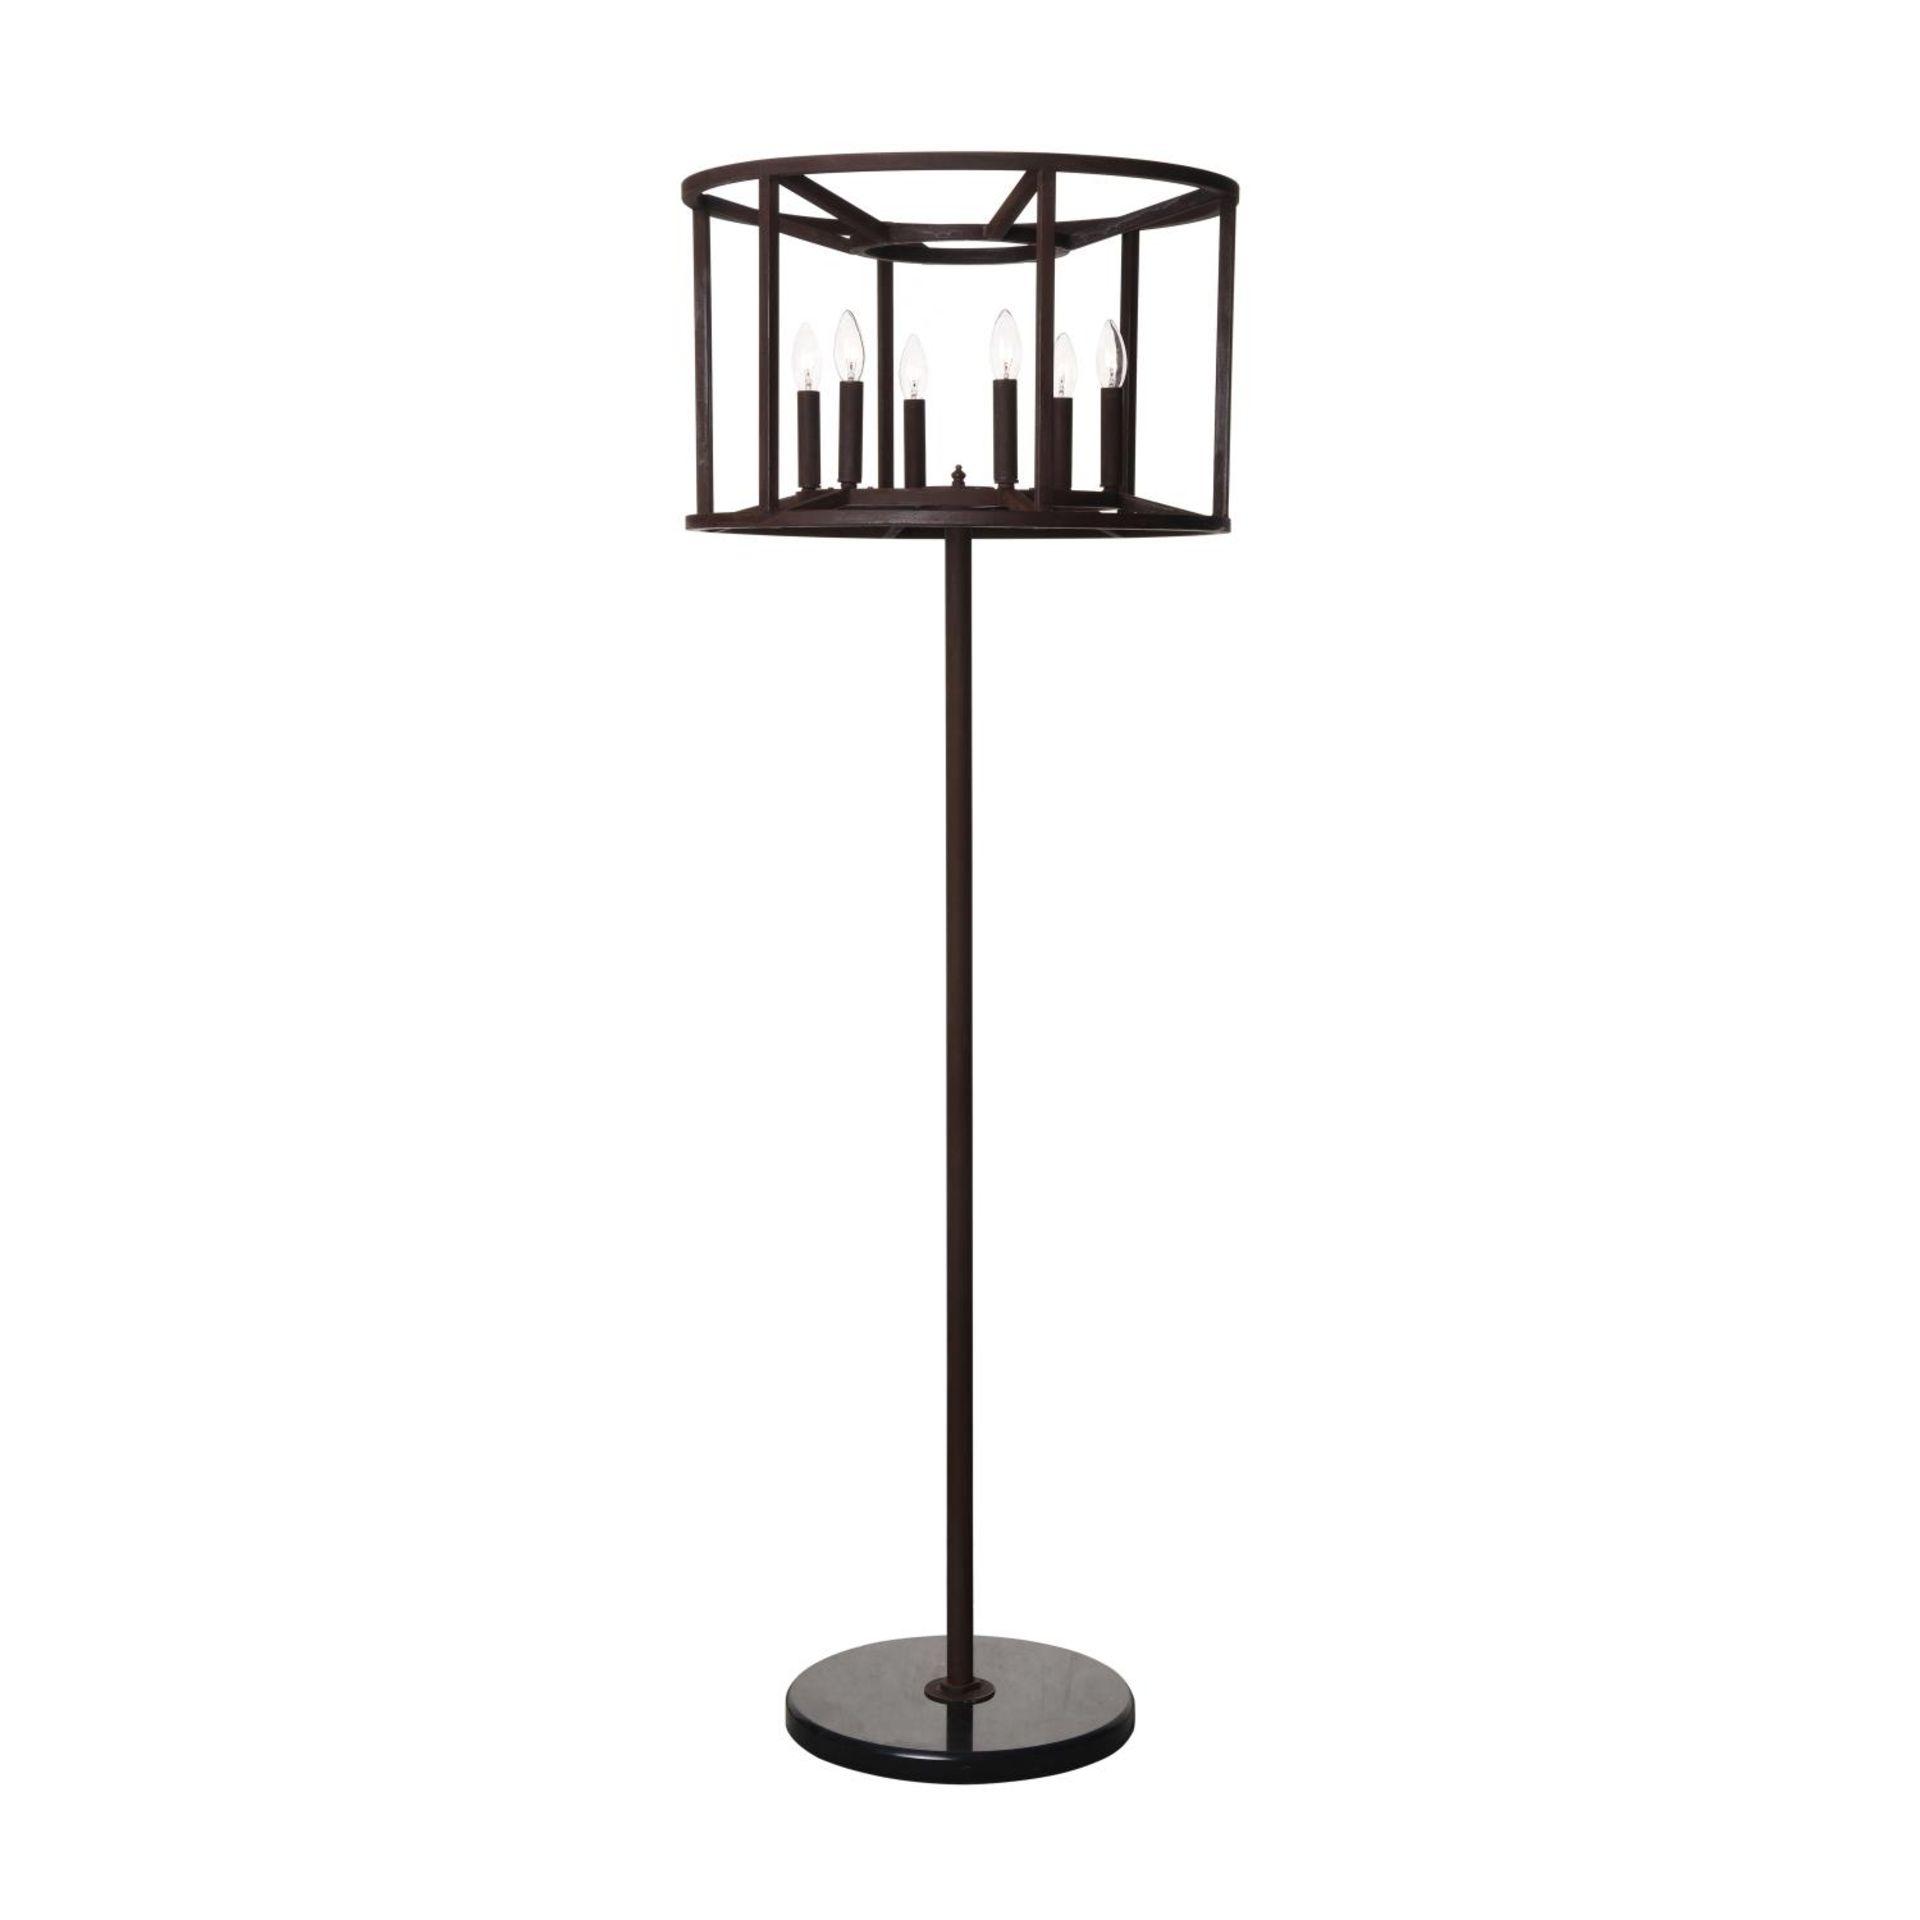 A CROWN FLOOR LAMP - ANTIQUE RUST 60cm x 60cm x 170cm (rrp £998) EU wired